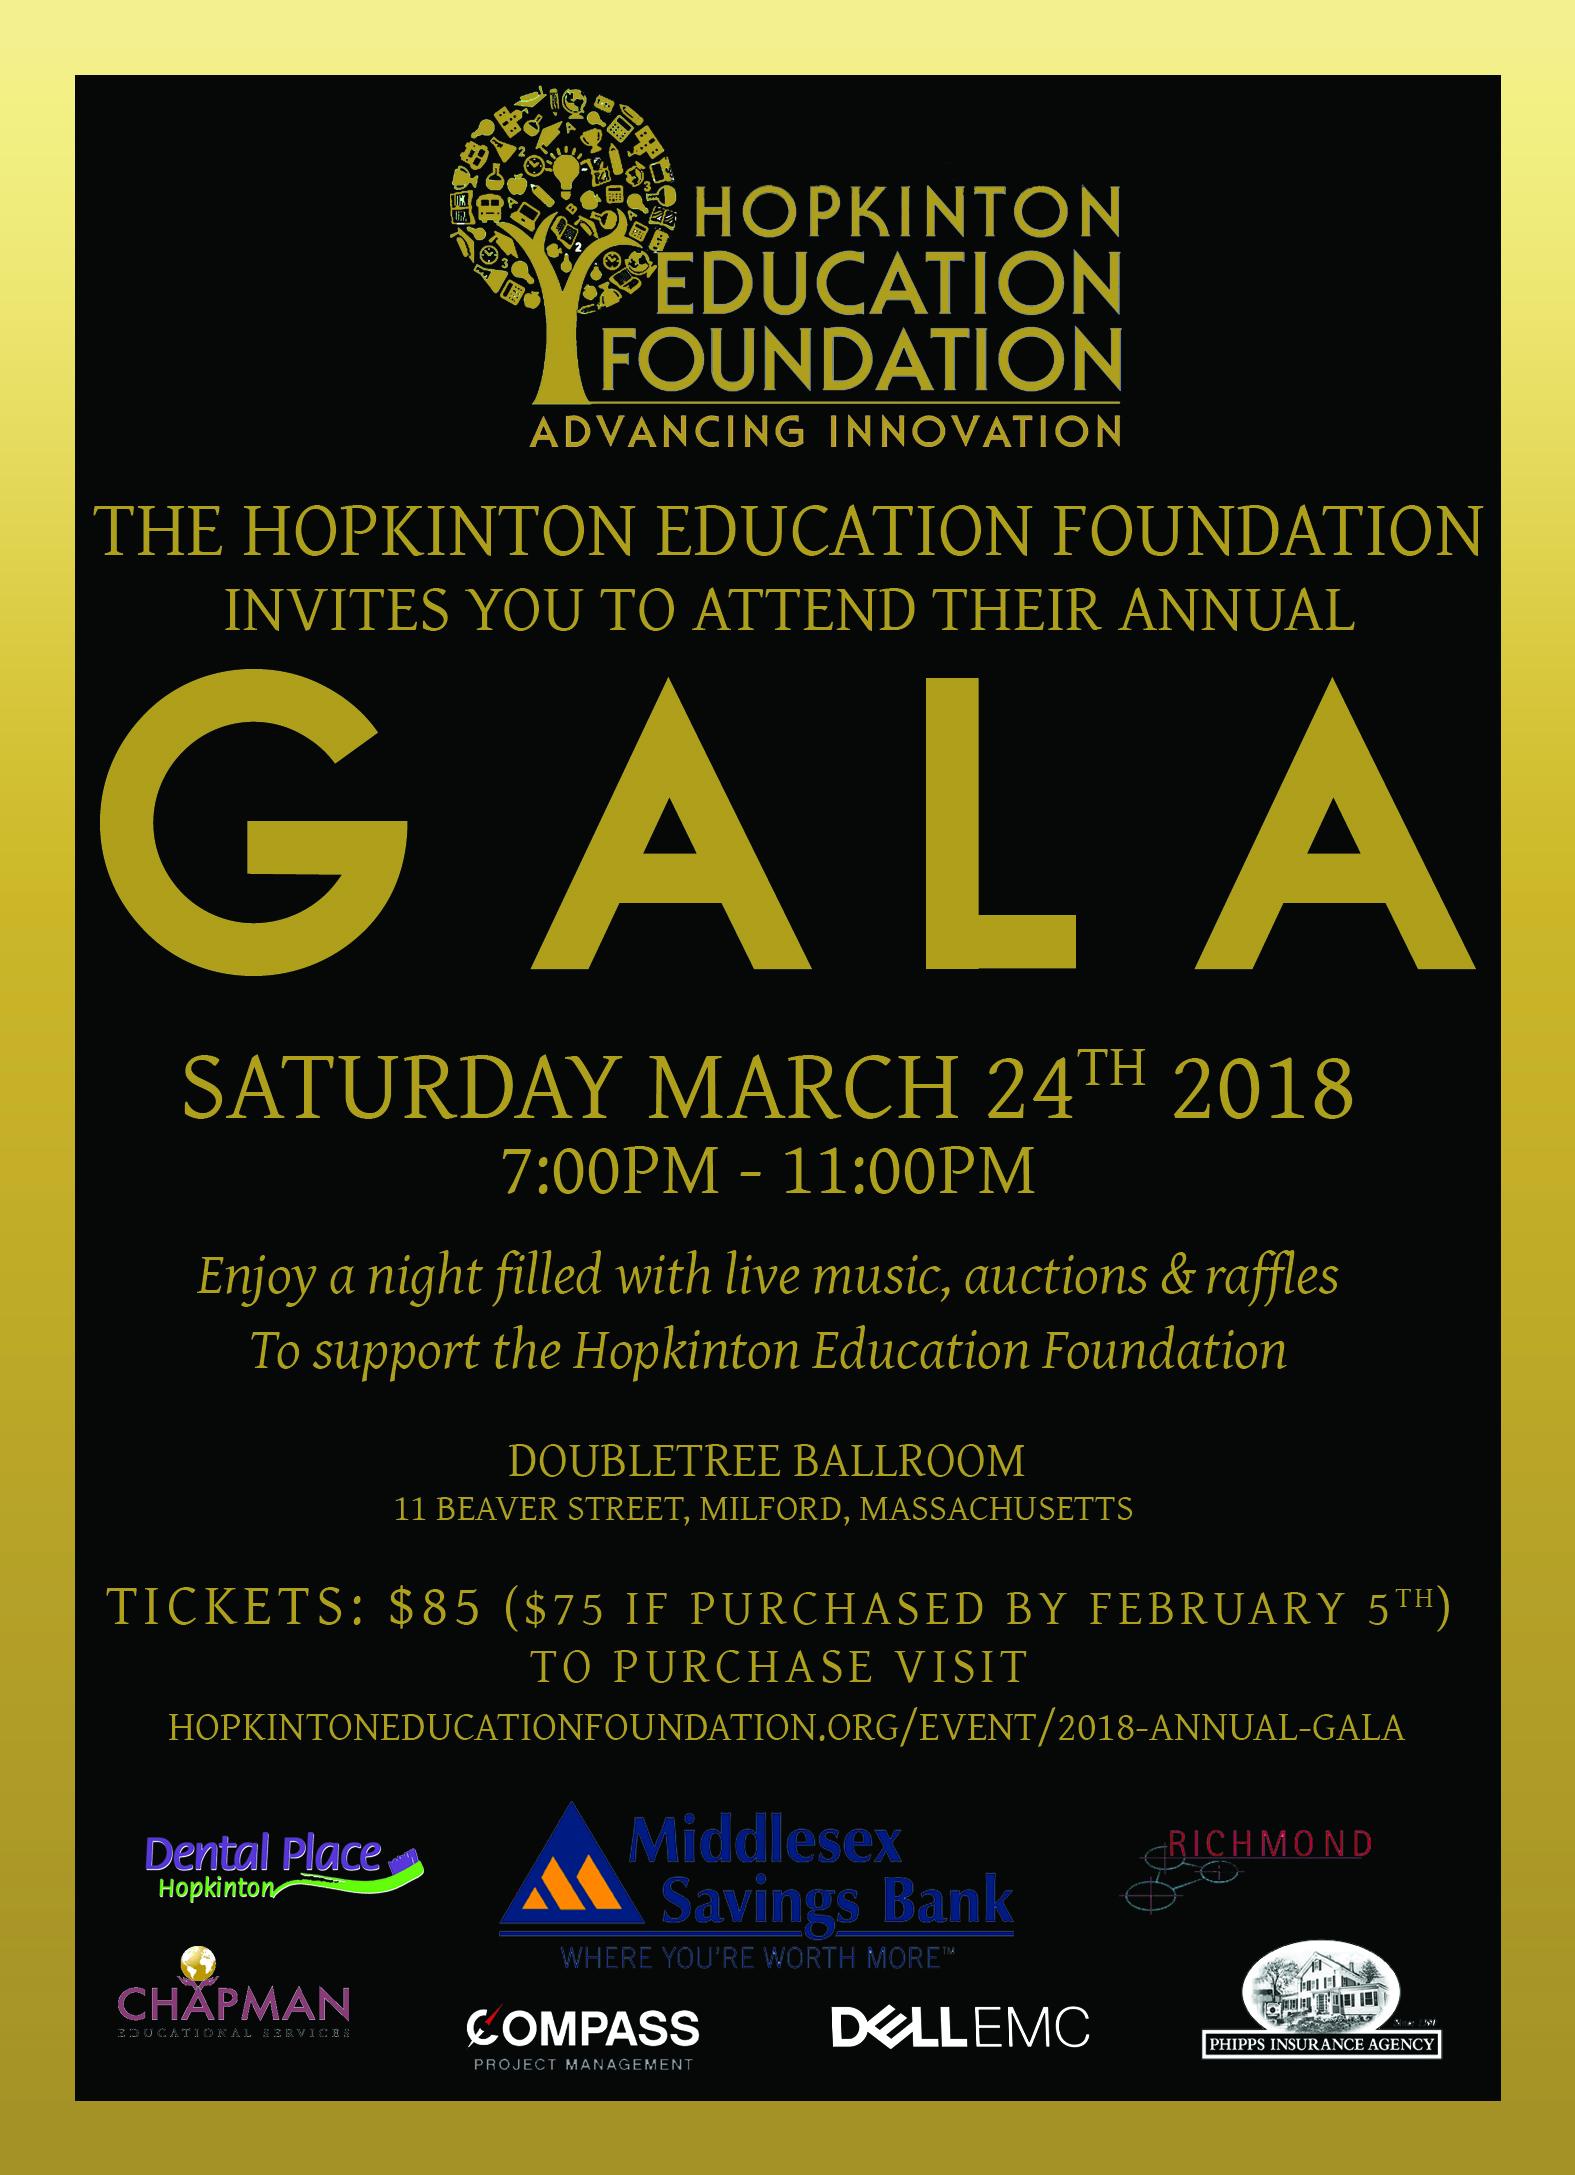 Hef gala invitation hopkinton education foundation hef gala invitation stopboris Images